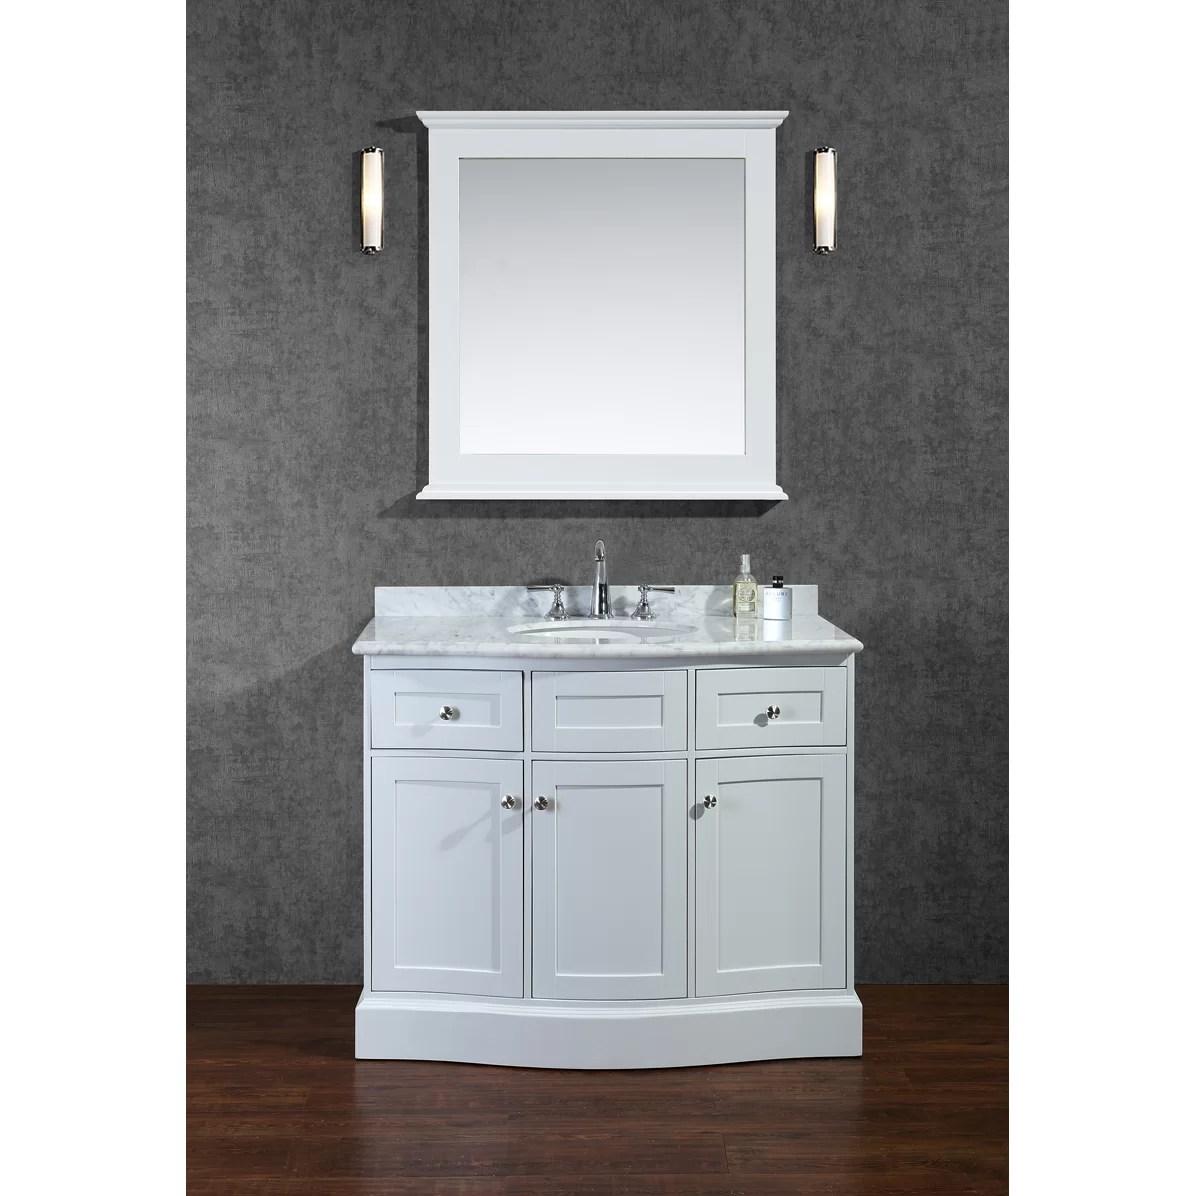 Ariel Bath Montauk 42 Single Bathroom Vanity Set with Mirror  Reviews  Wayfair